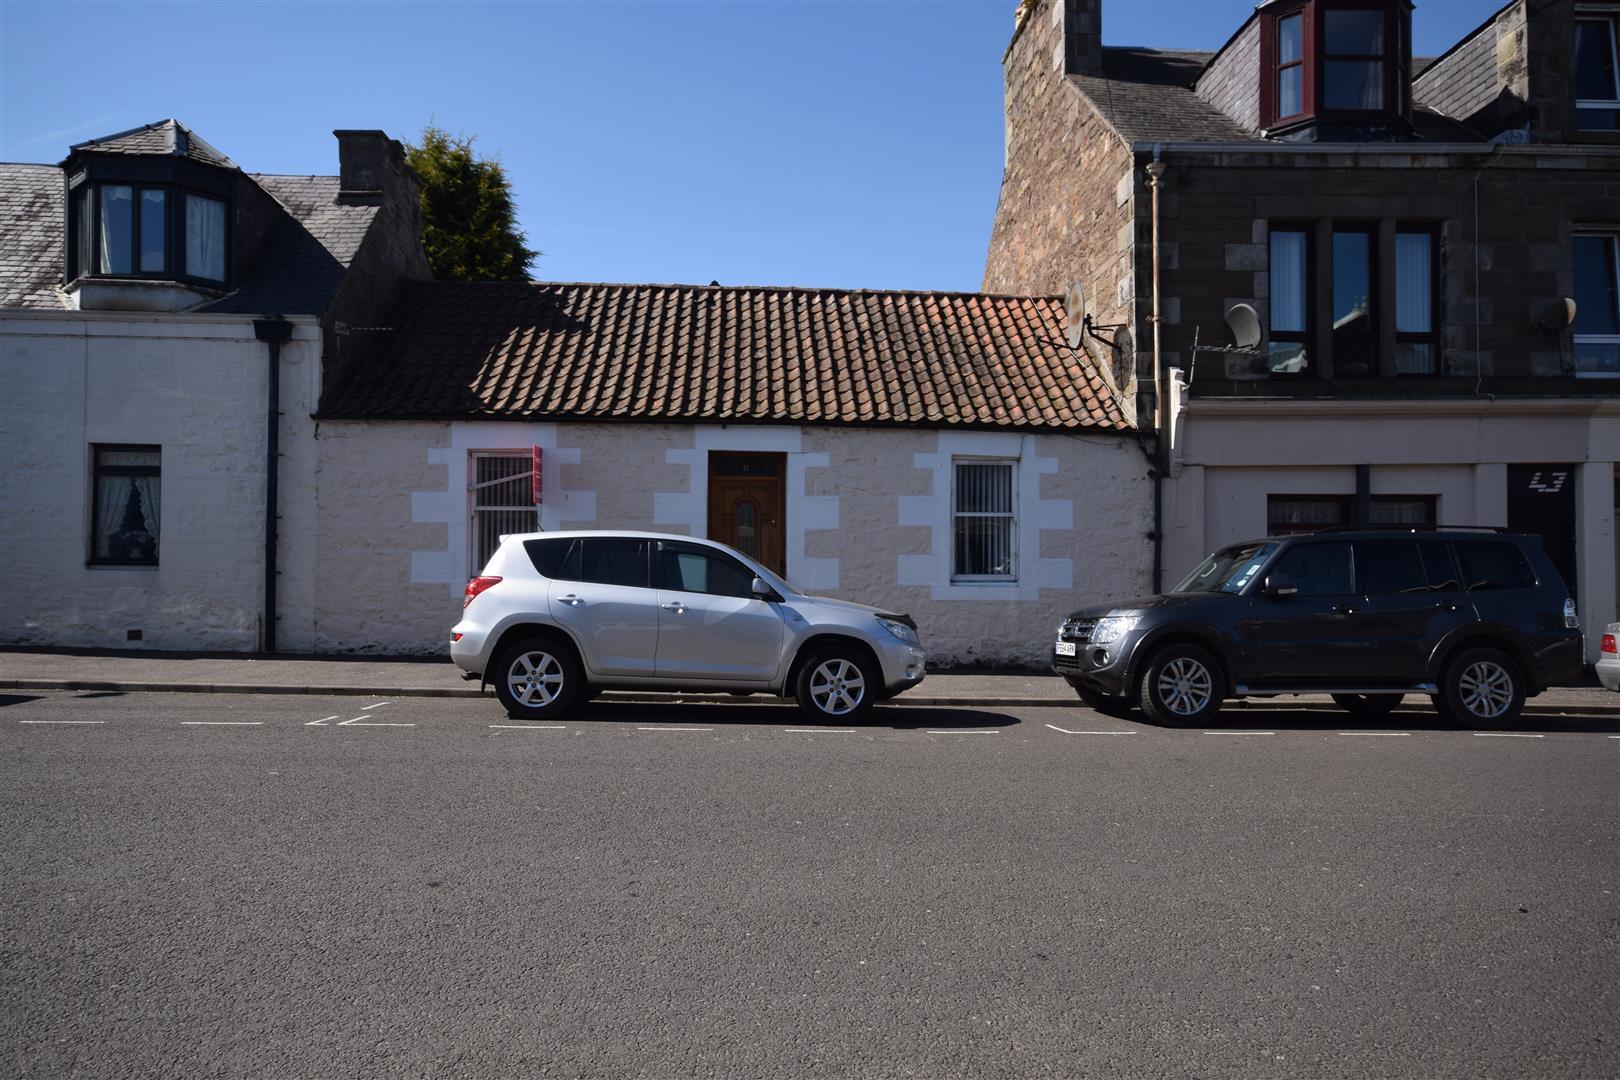 47, Castle Street, Tayport, Fife, DD6 9AB, UK